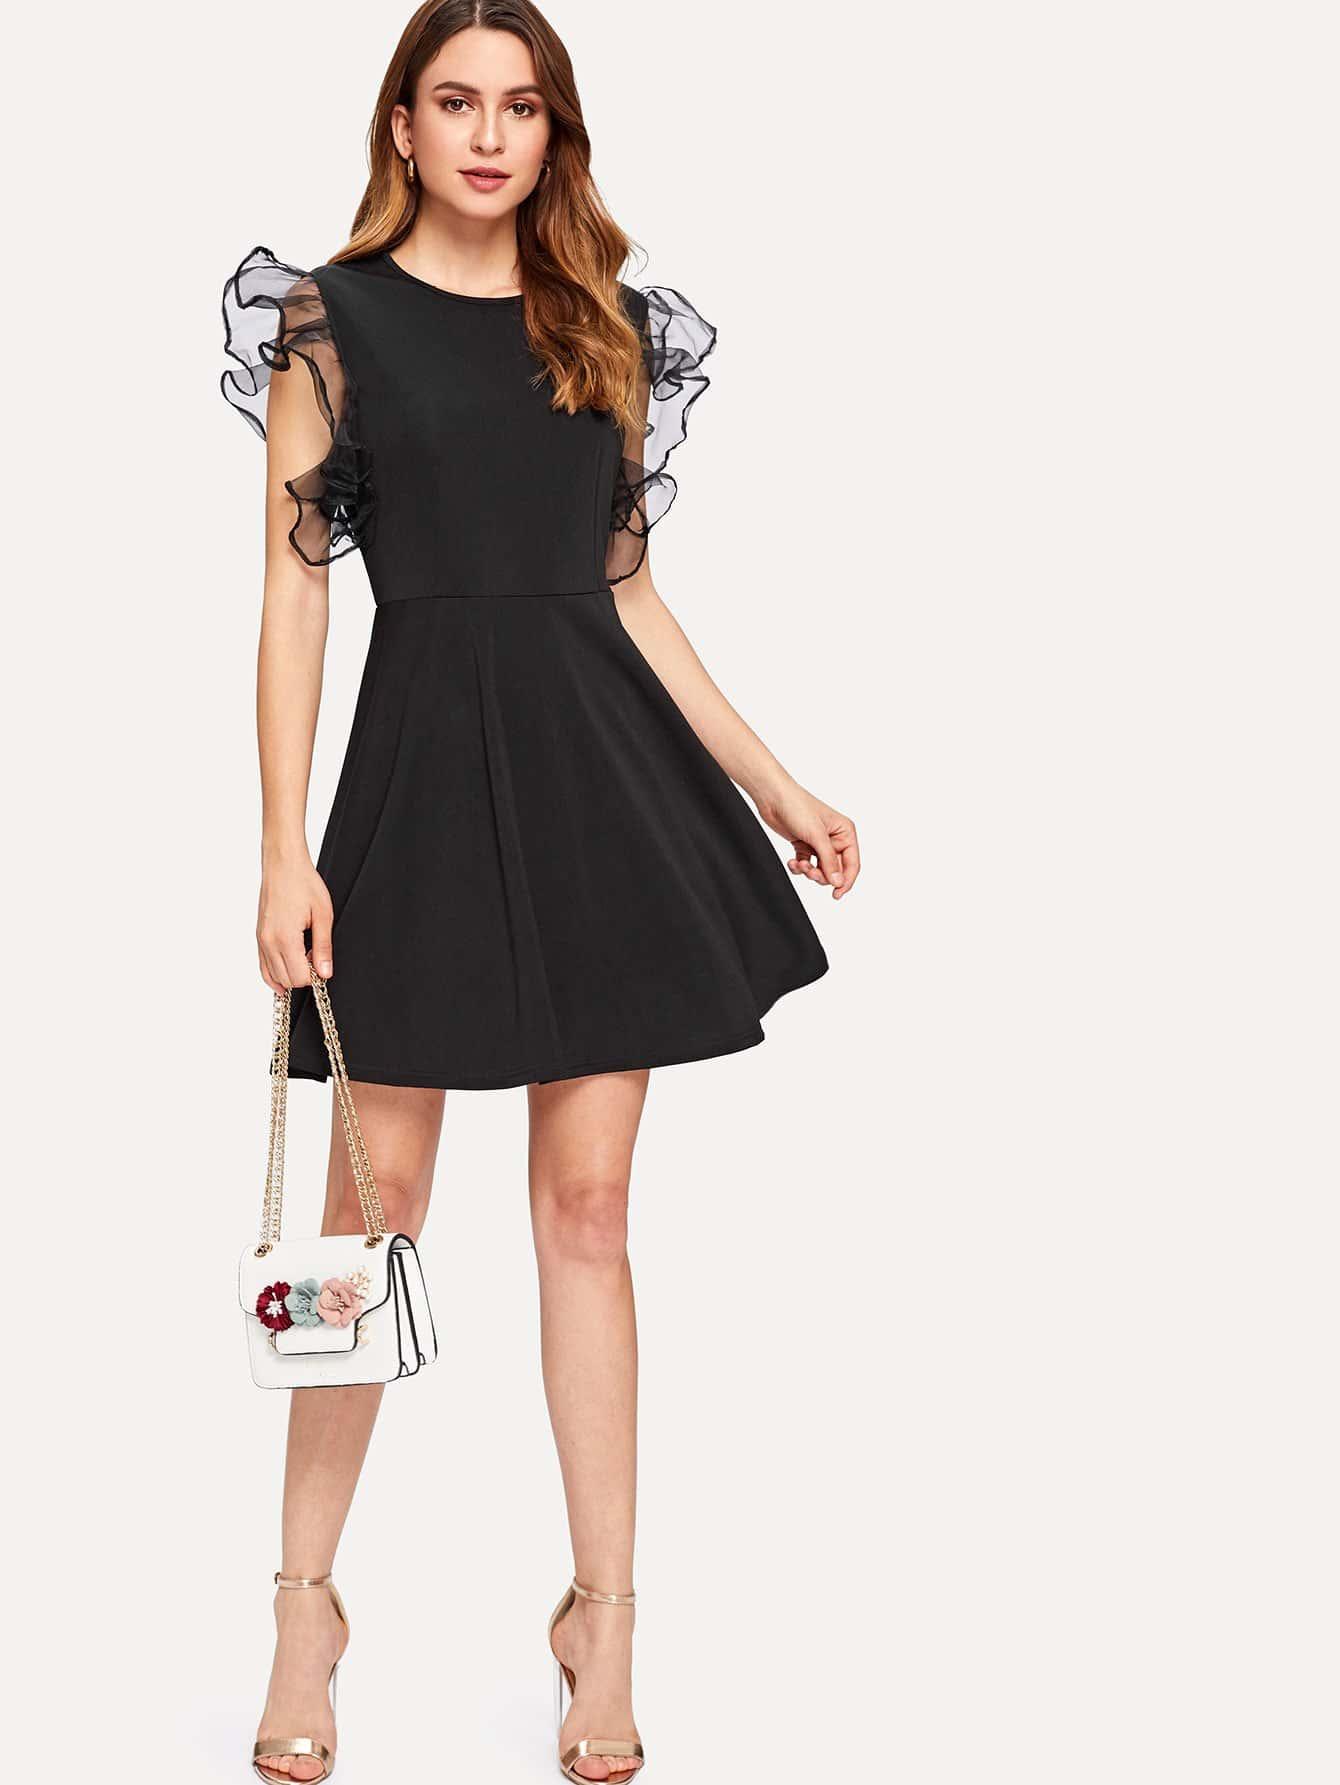 Ruffle Mesh Panel Dress ruffle mesh panel dress